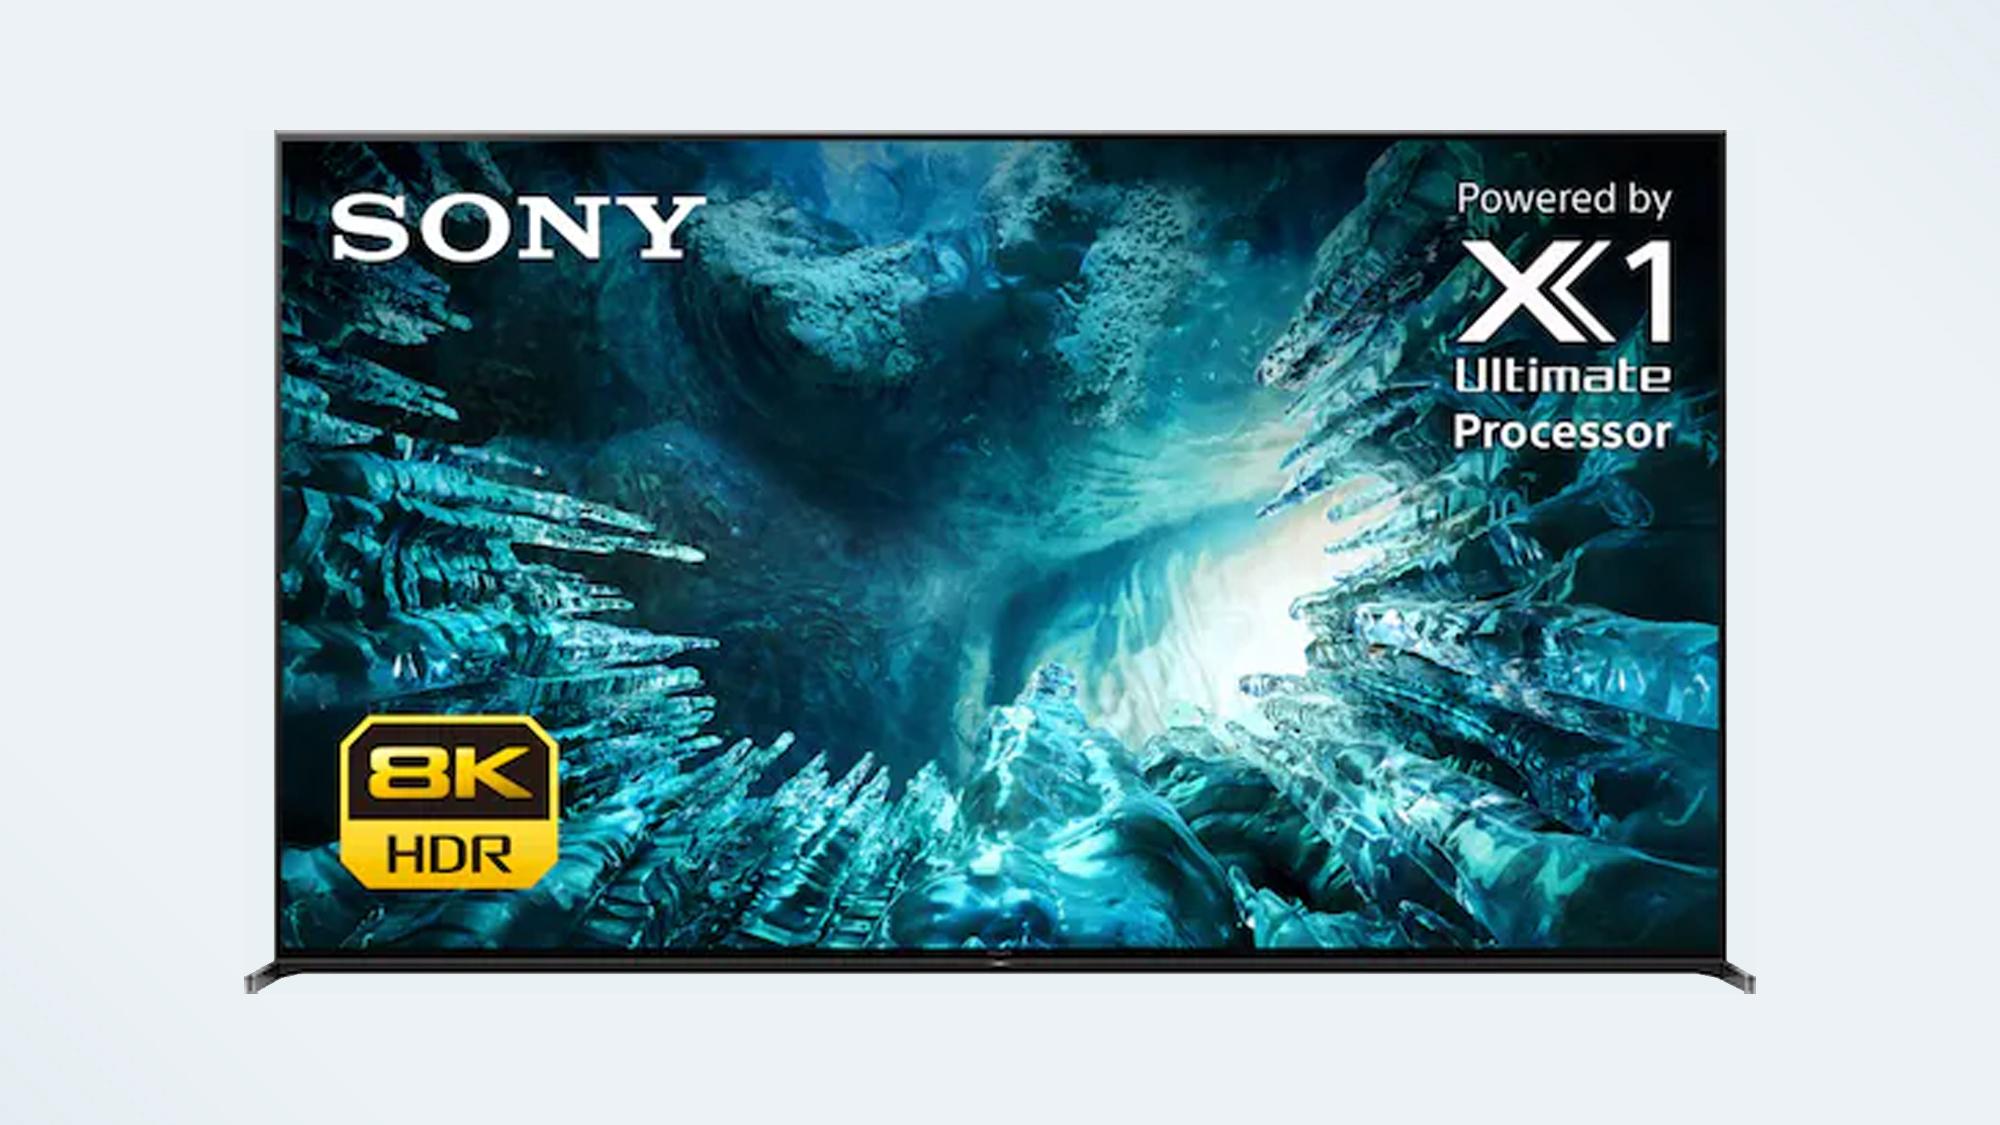 Best 8K TVs: Sony Z8H 8K Android TV